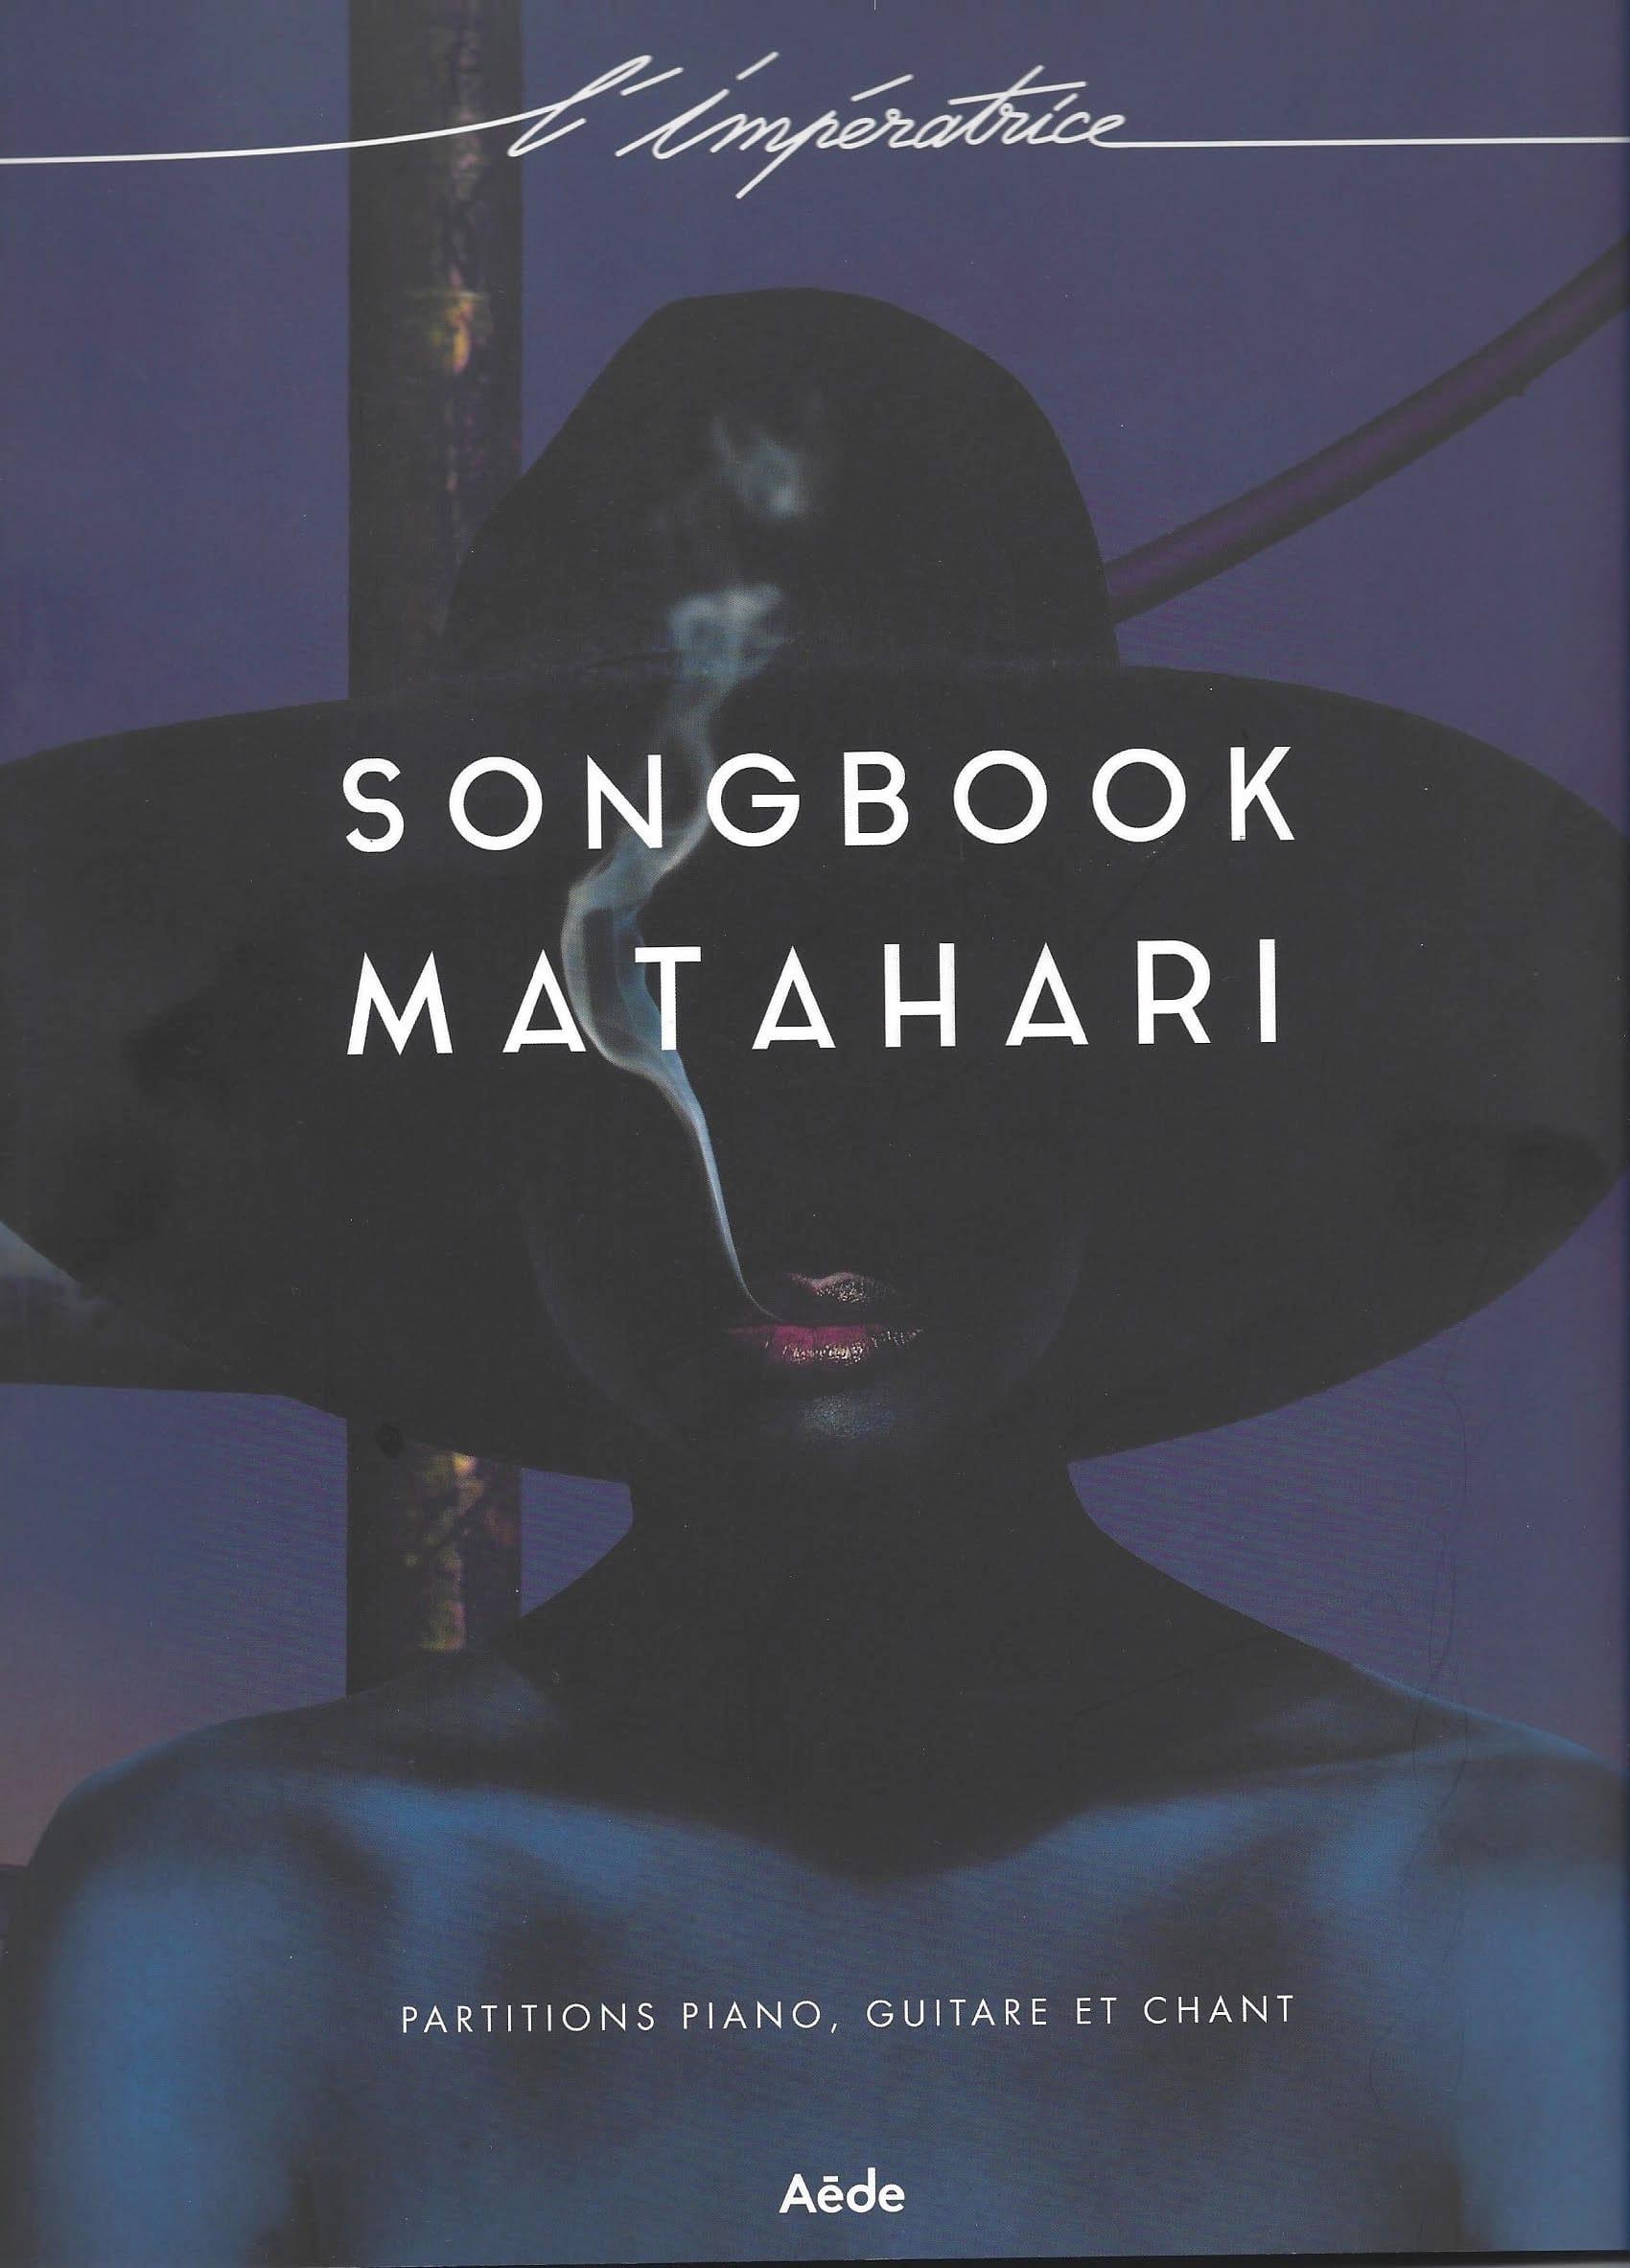 Matahari - Songbook - L'Impératrice - Partition - laflutedepan.com